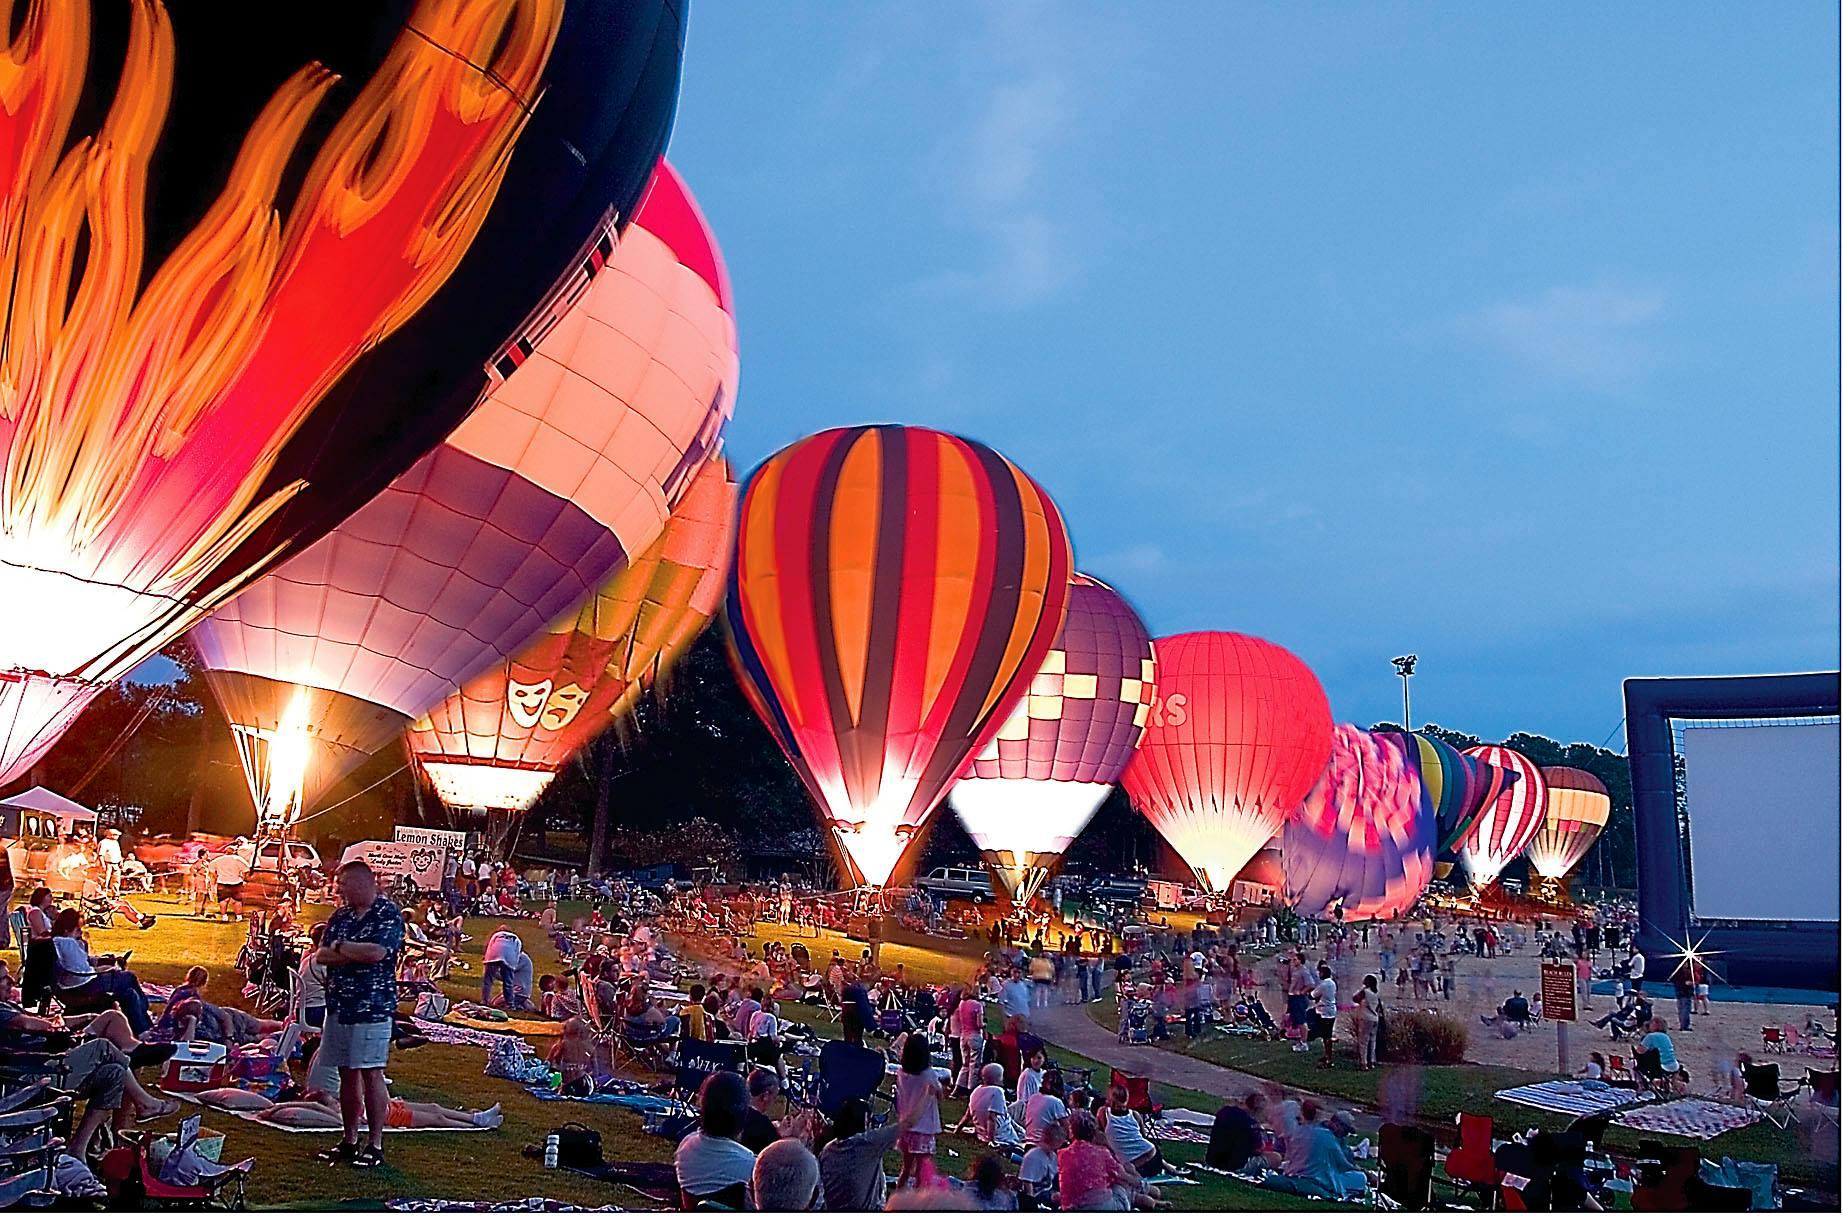 sky high hot air balloon fest